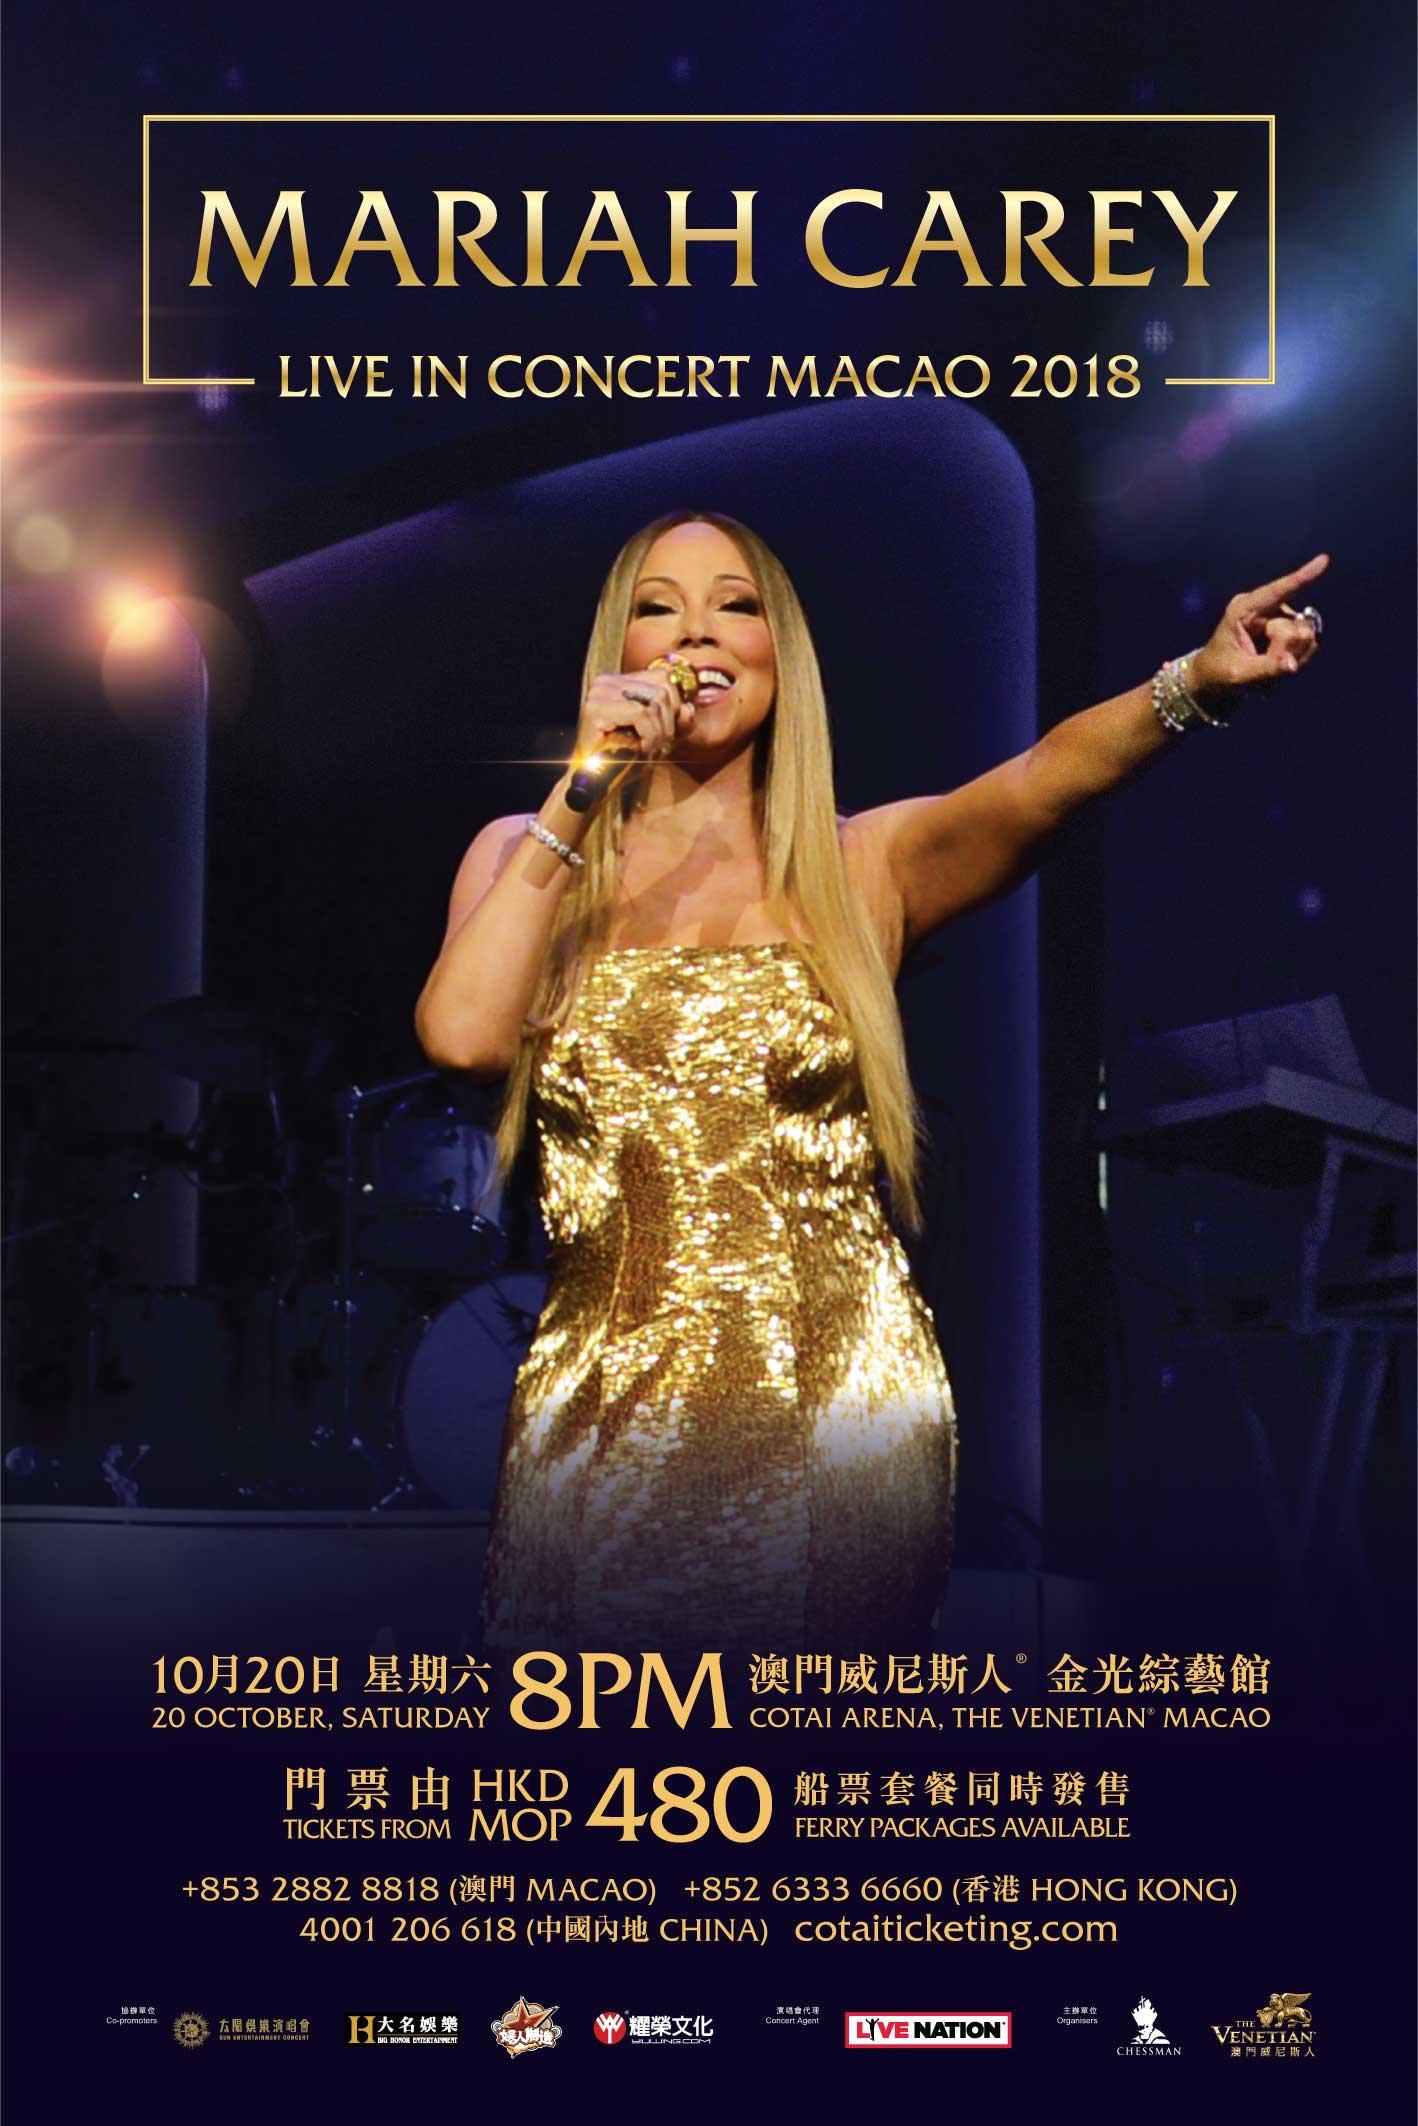 Macau dating